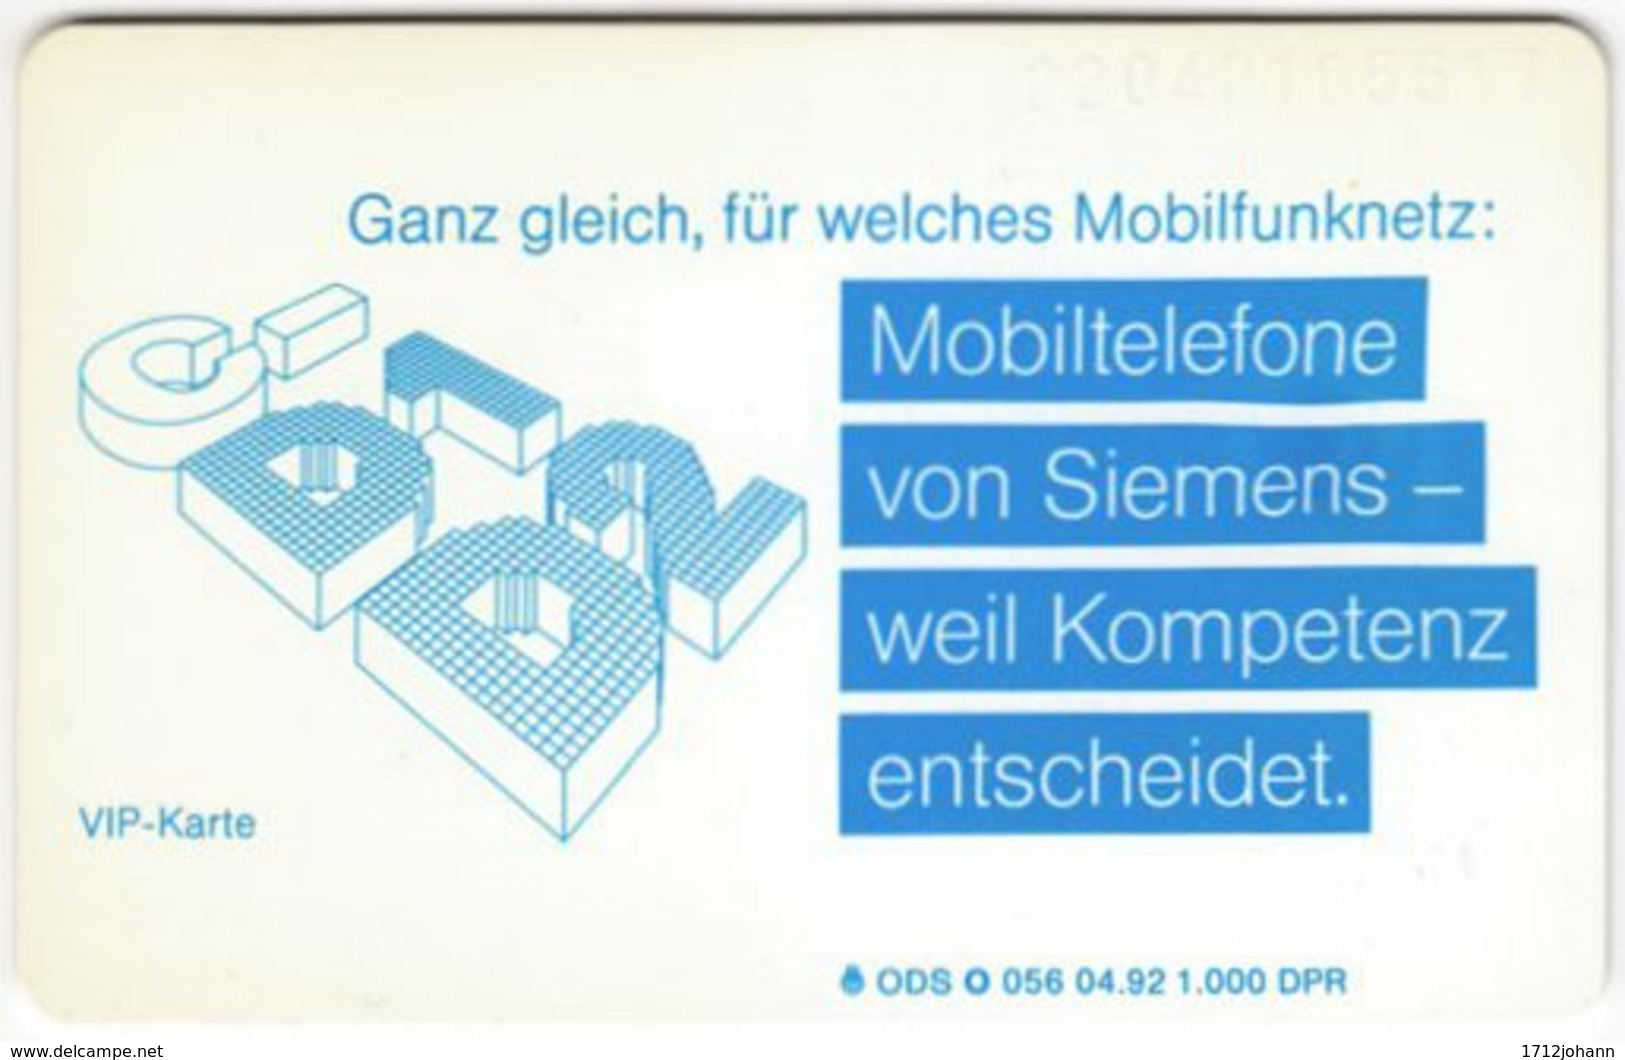 GERMANY O-Serie A-976 - 056 04.92 - MINT - O-Series: Kundenserie Vom Sammlerservice Ausgeschlossen